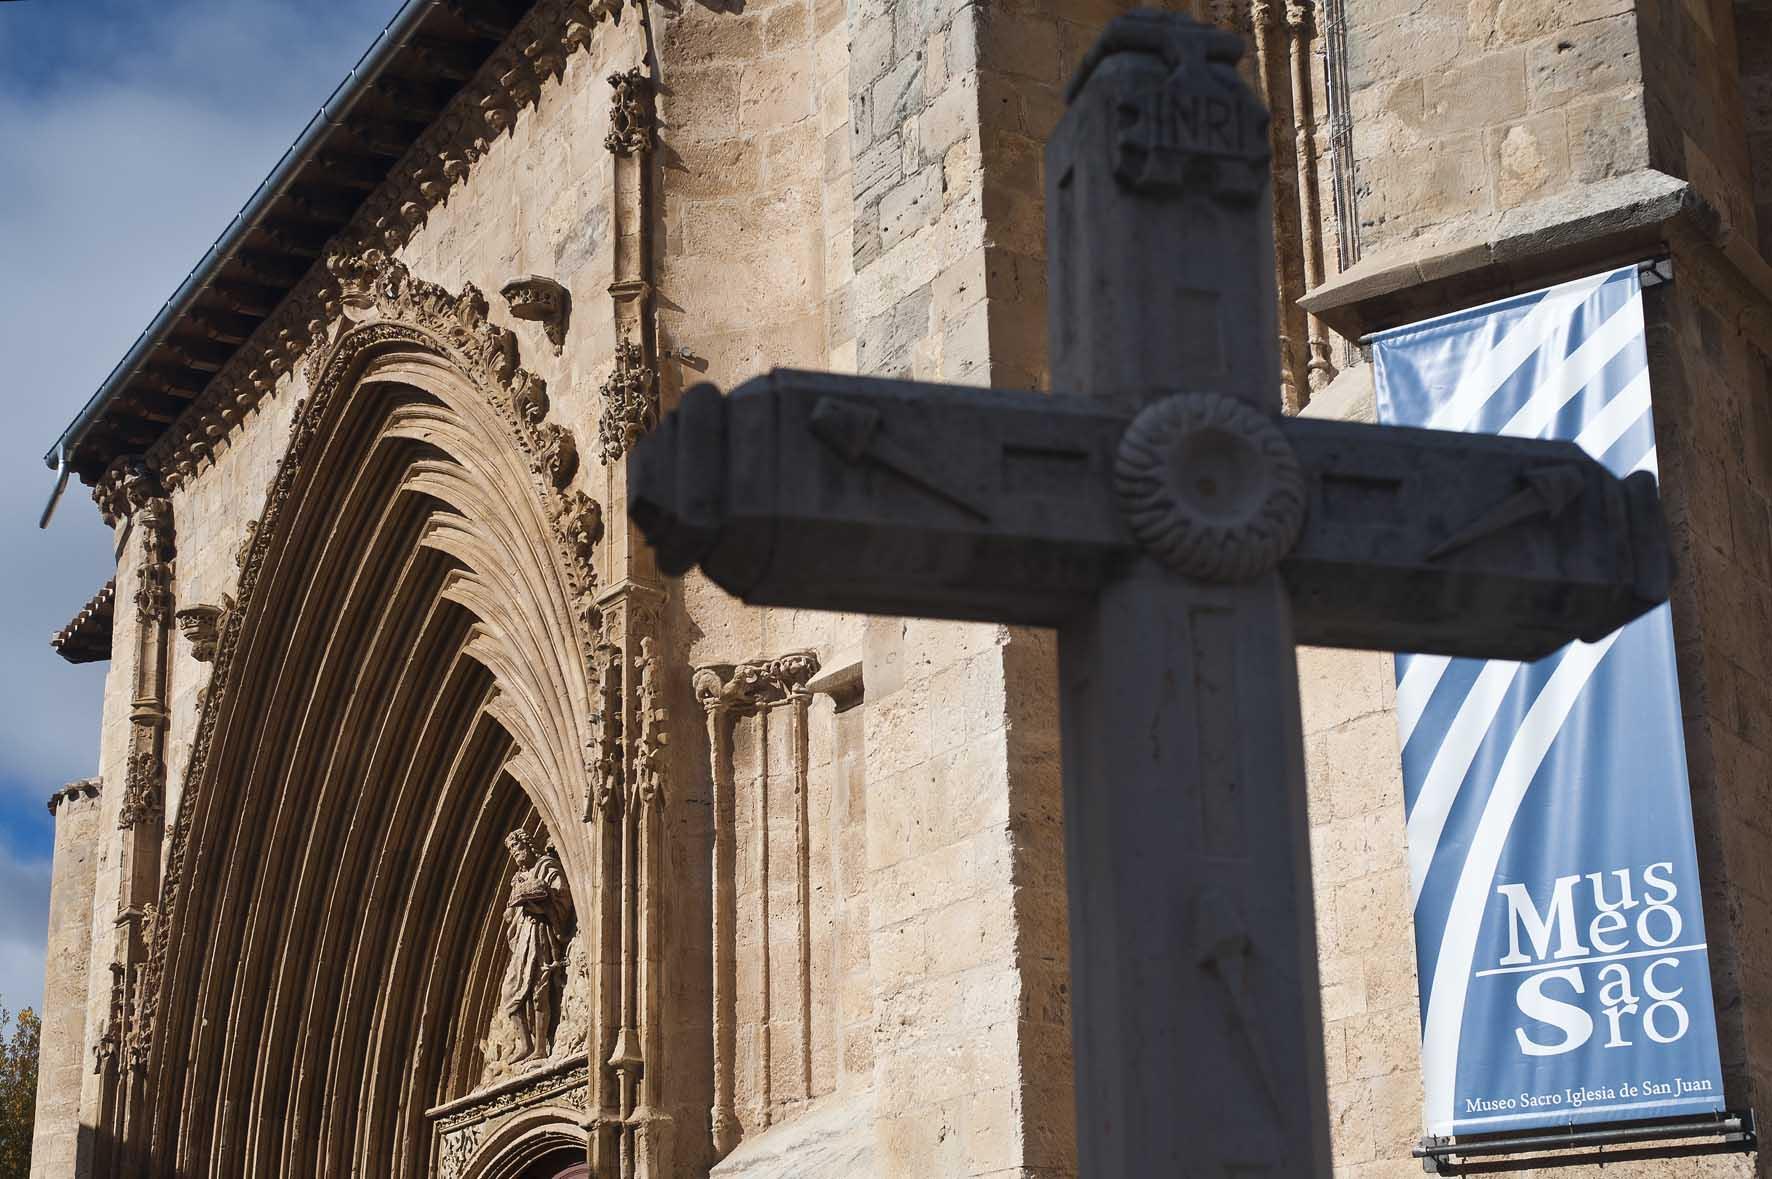 Iglesia de San Juan Museo de arte sacro Aranda de Duero